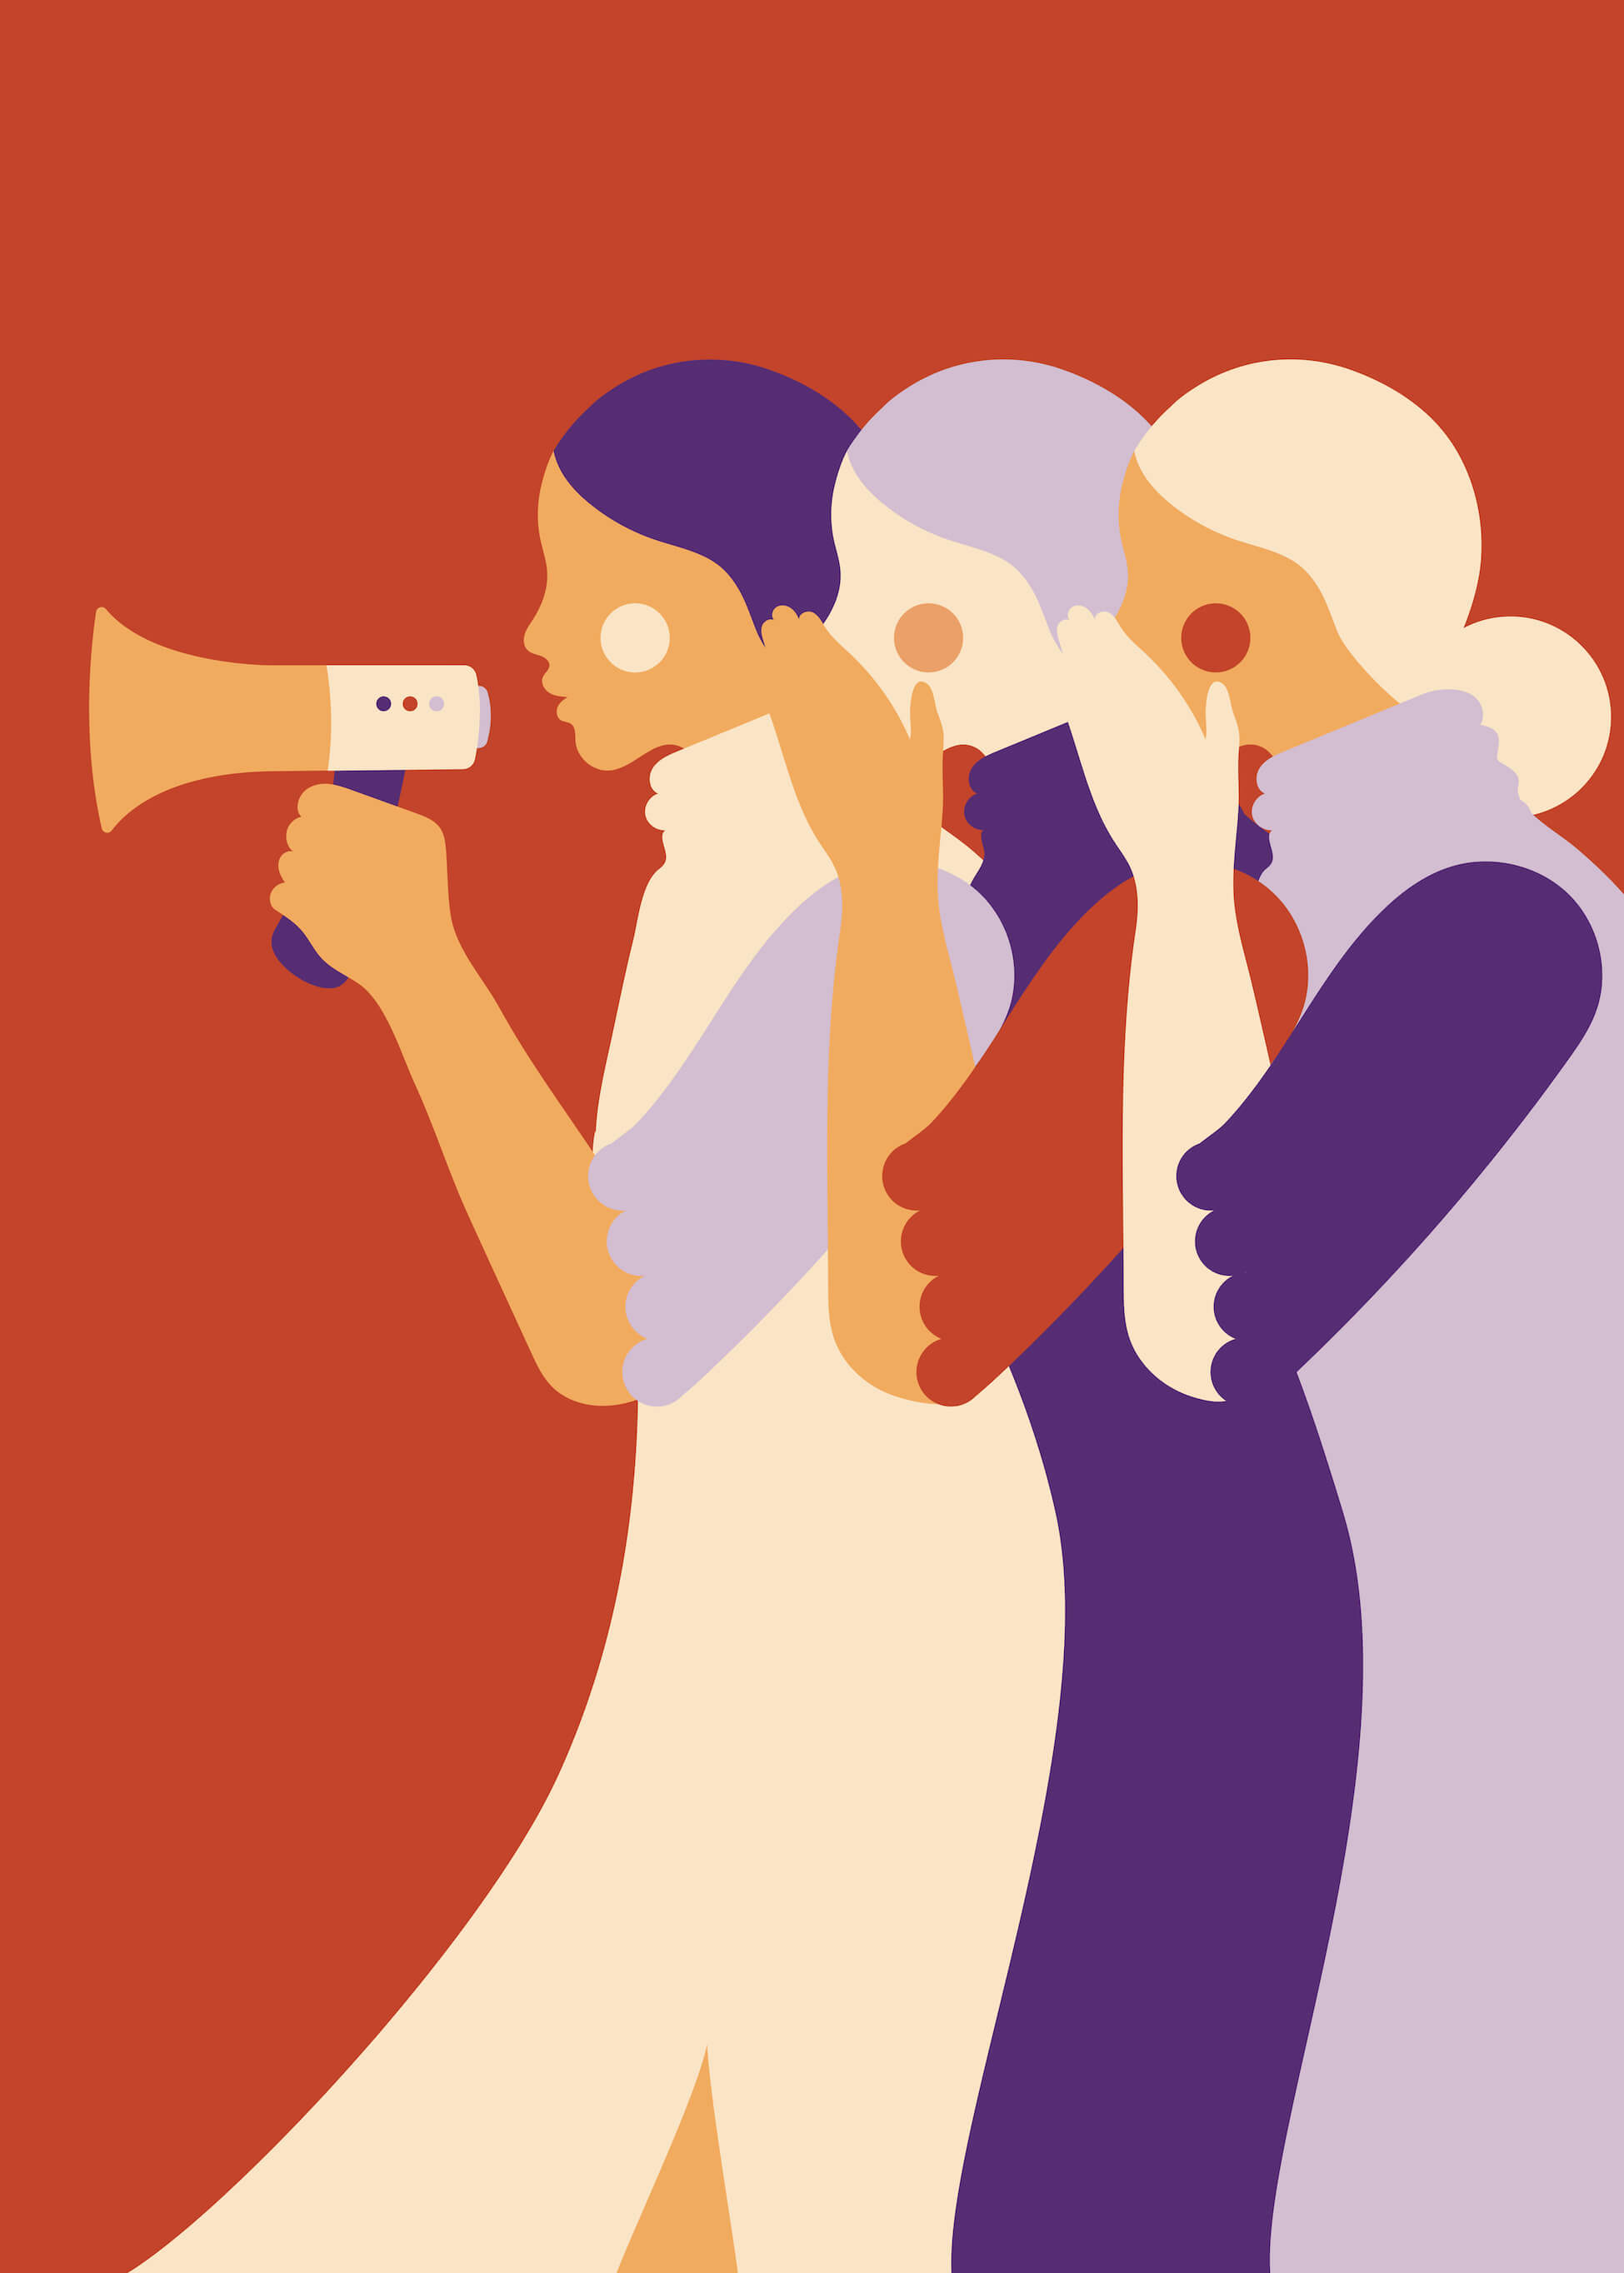 Amplify Women's Voices main image